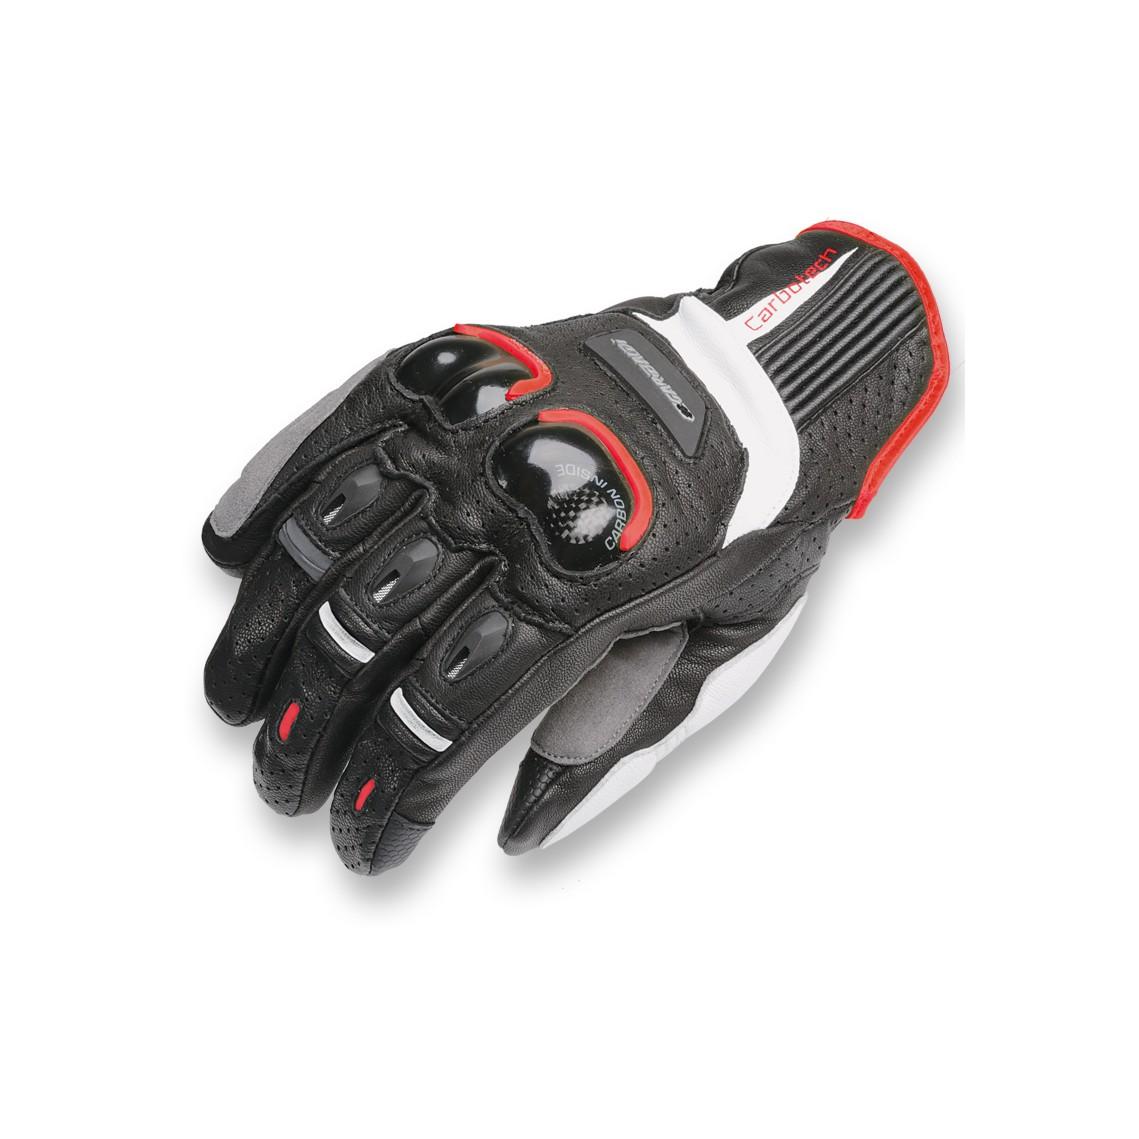 Guantes cortos Racing Garibaldi Carbotech negro / rojo